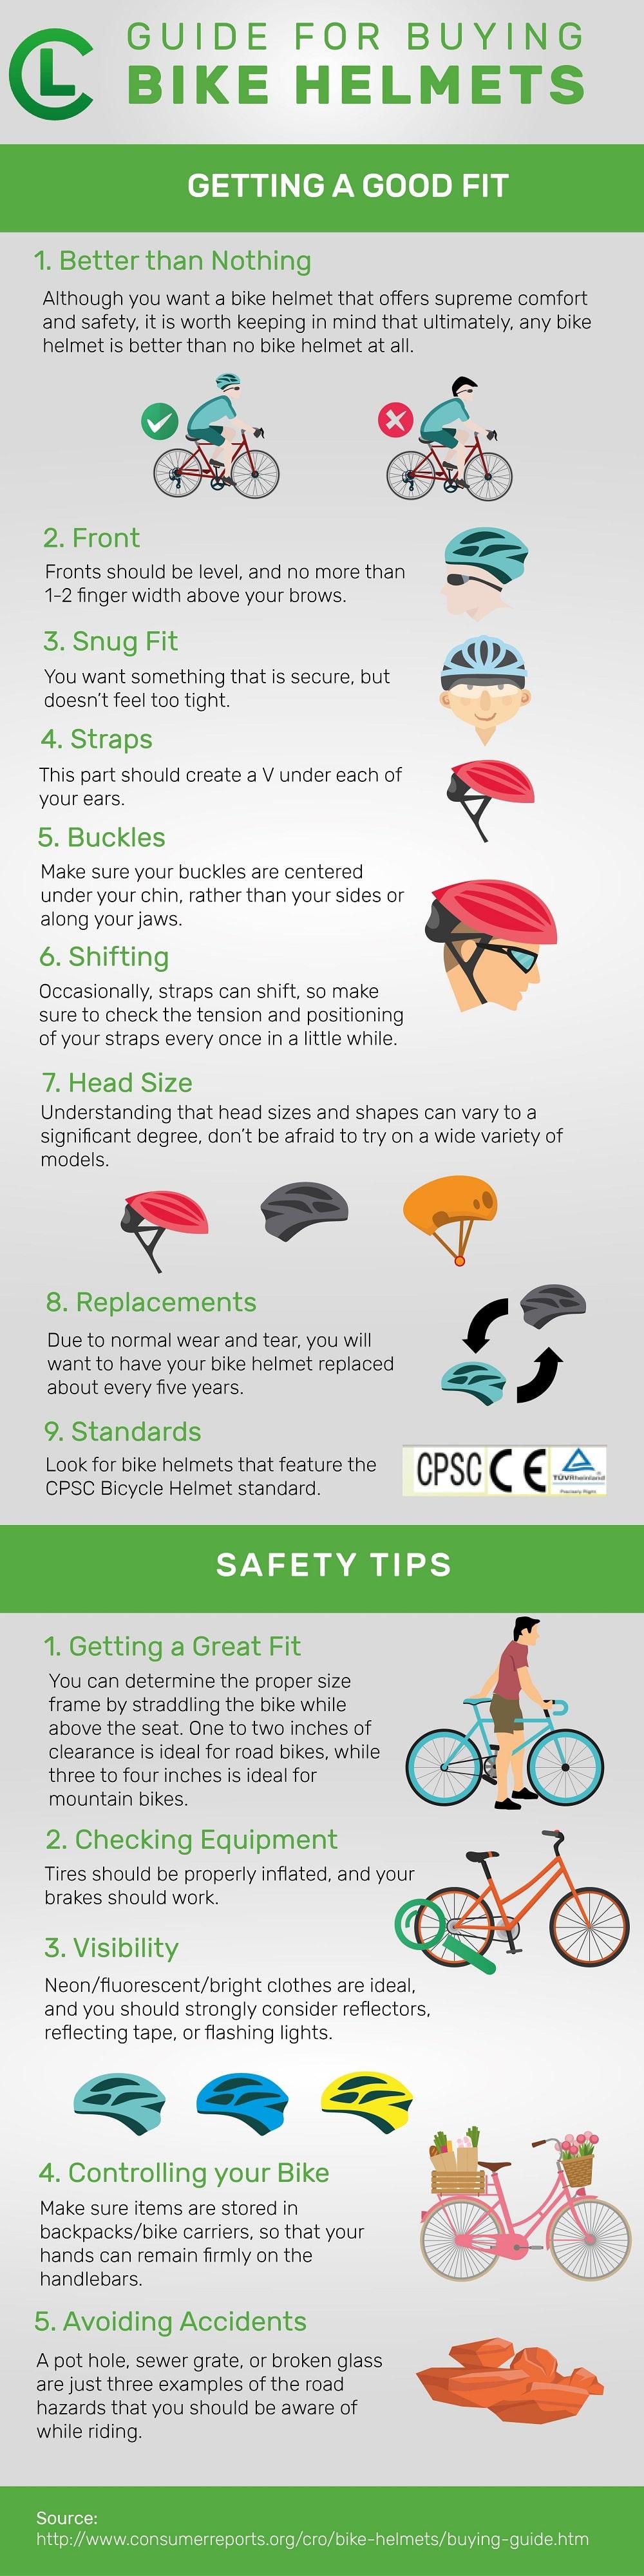 Guide For Buying Bike Helmets